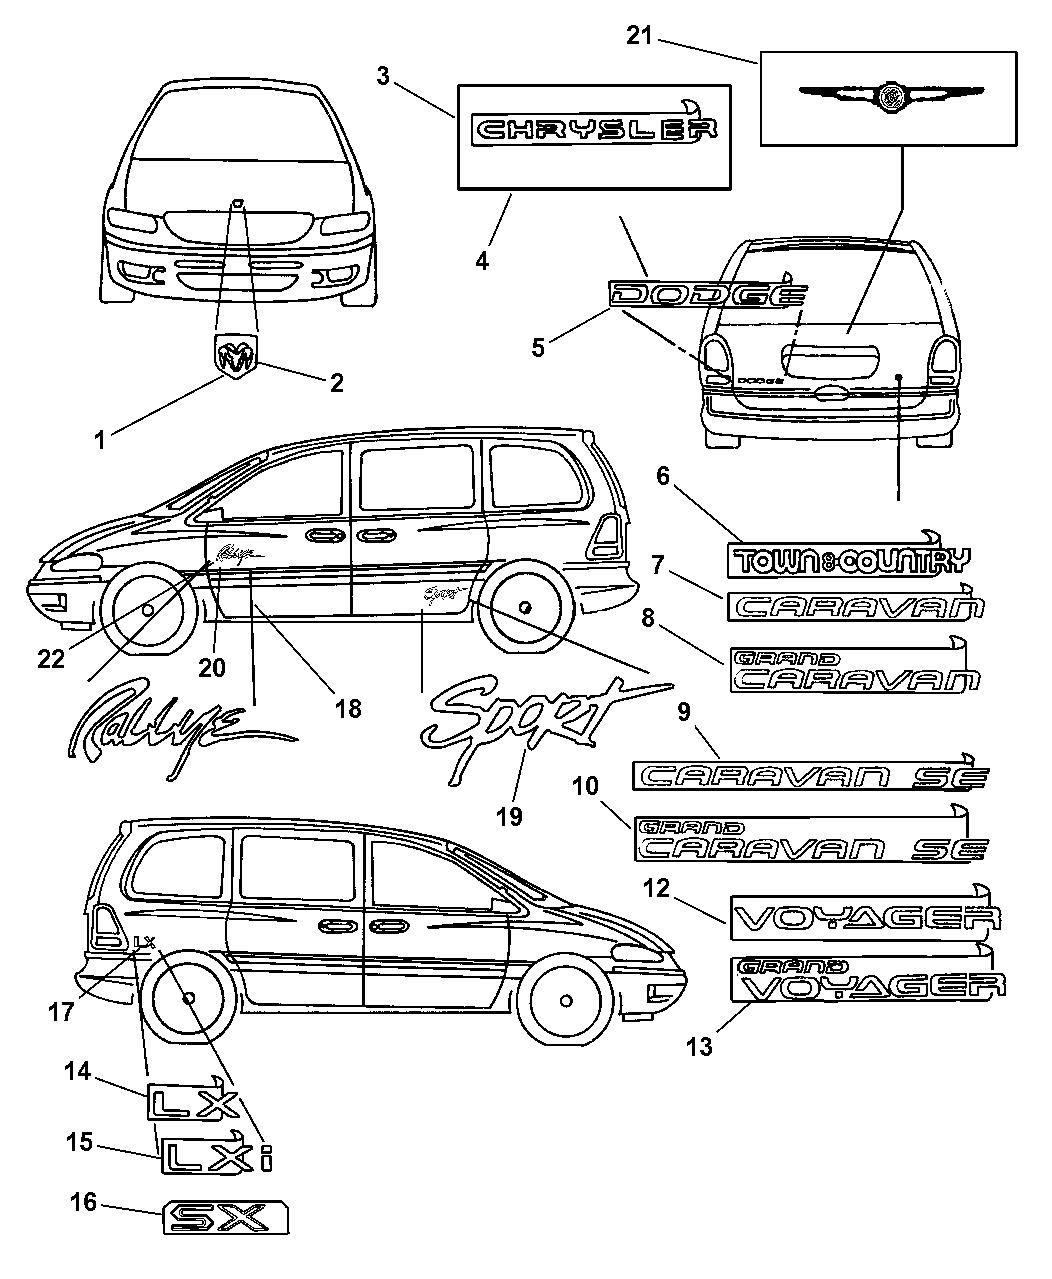 1999 Dodge Caravan Nameplates